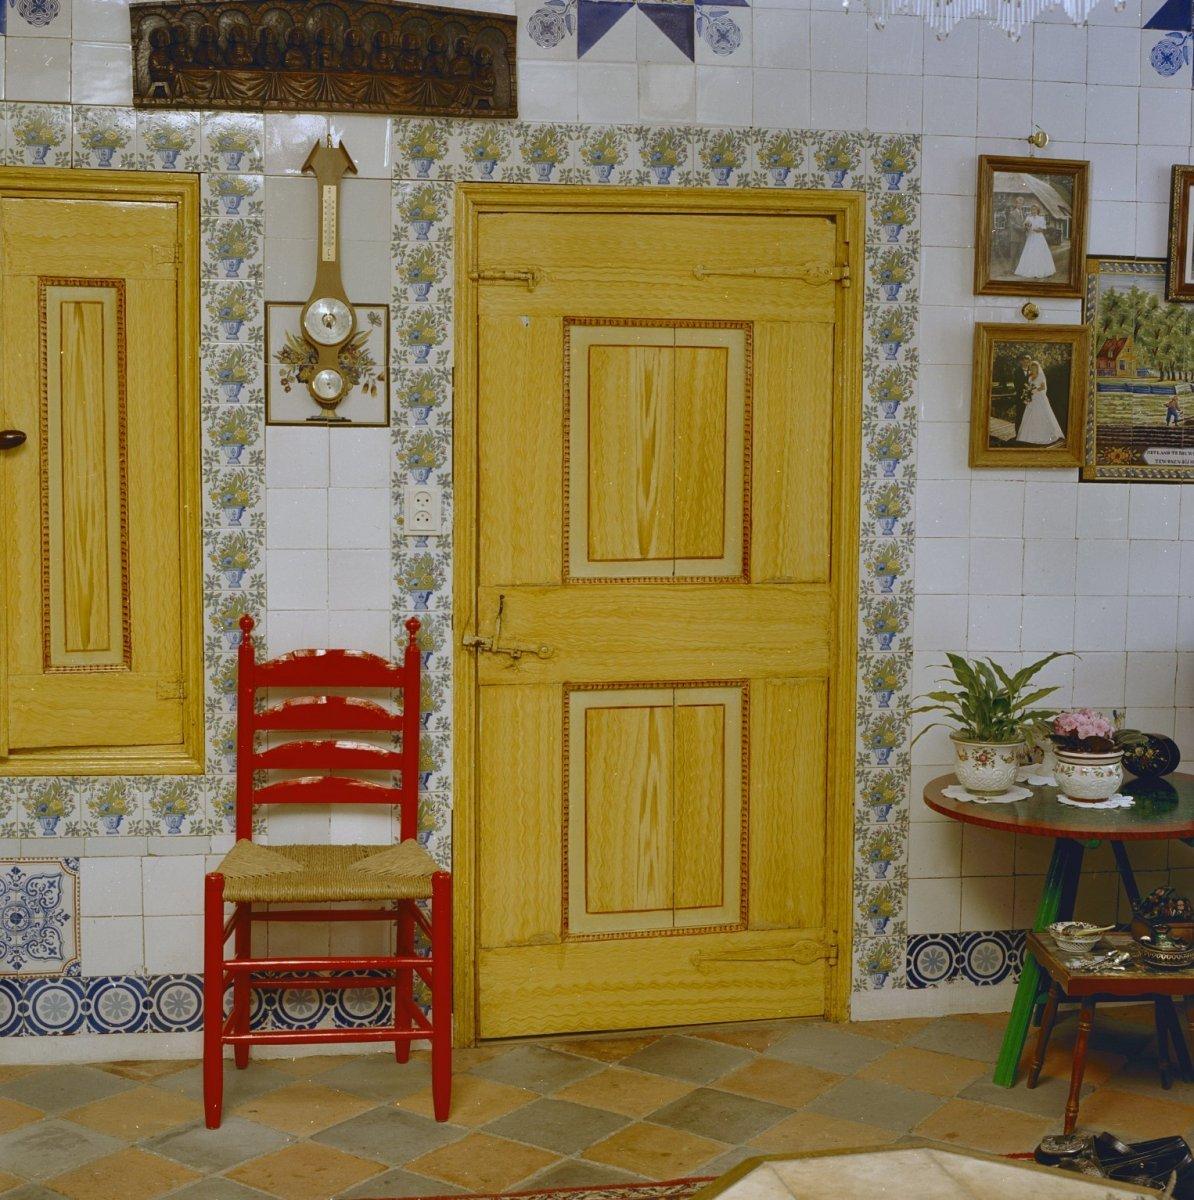 File:Interieur, deur met houtmotief. Achterzijde van de deur is rood ...